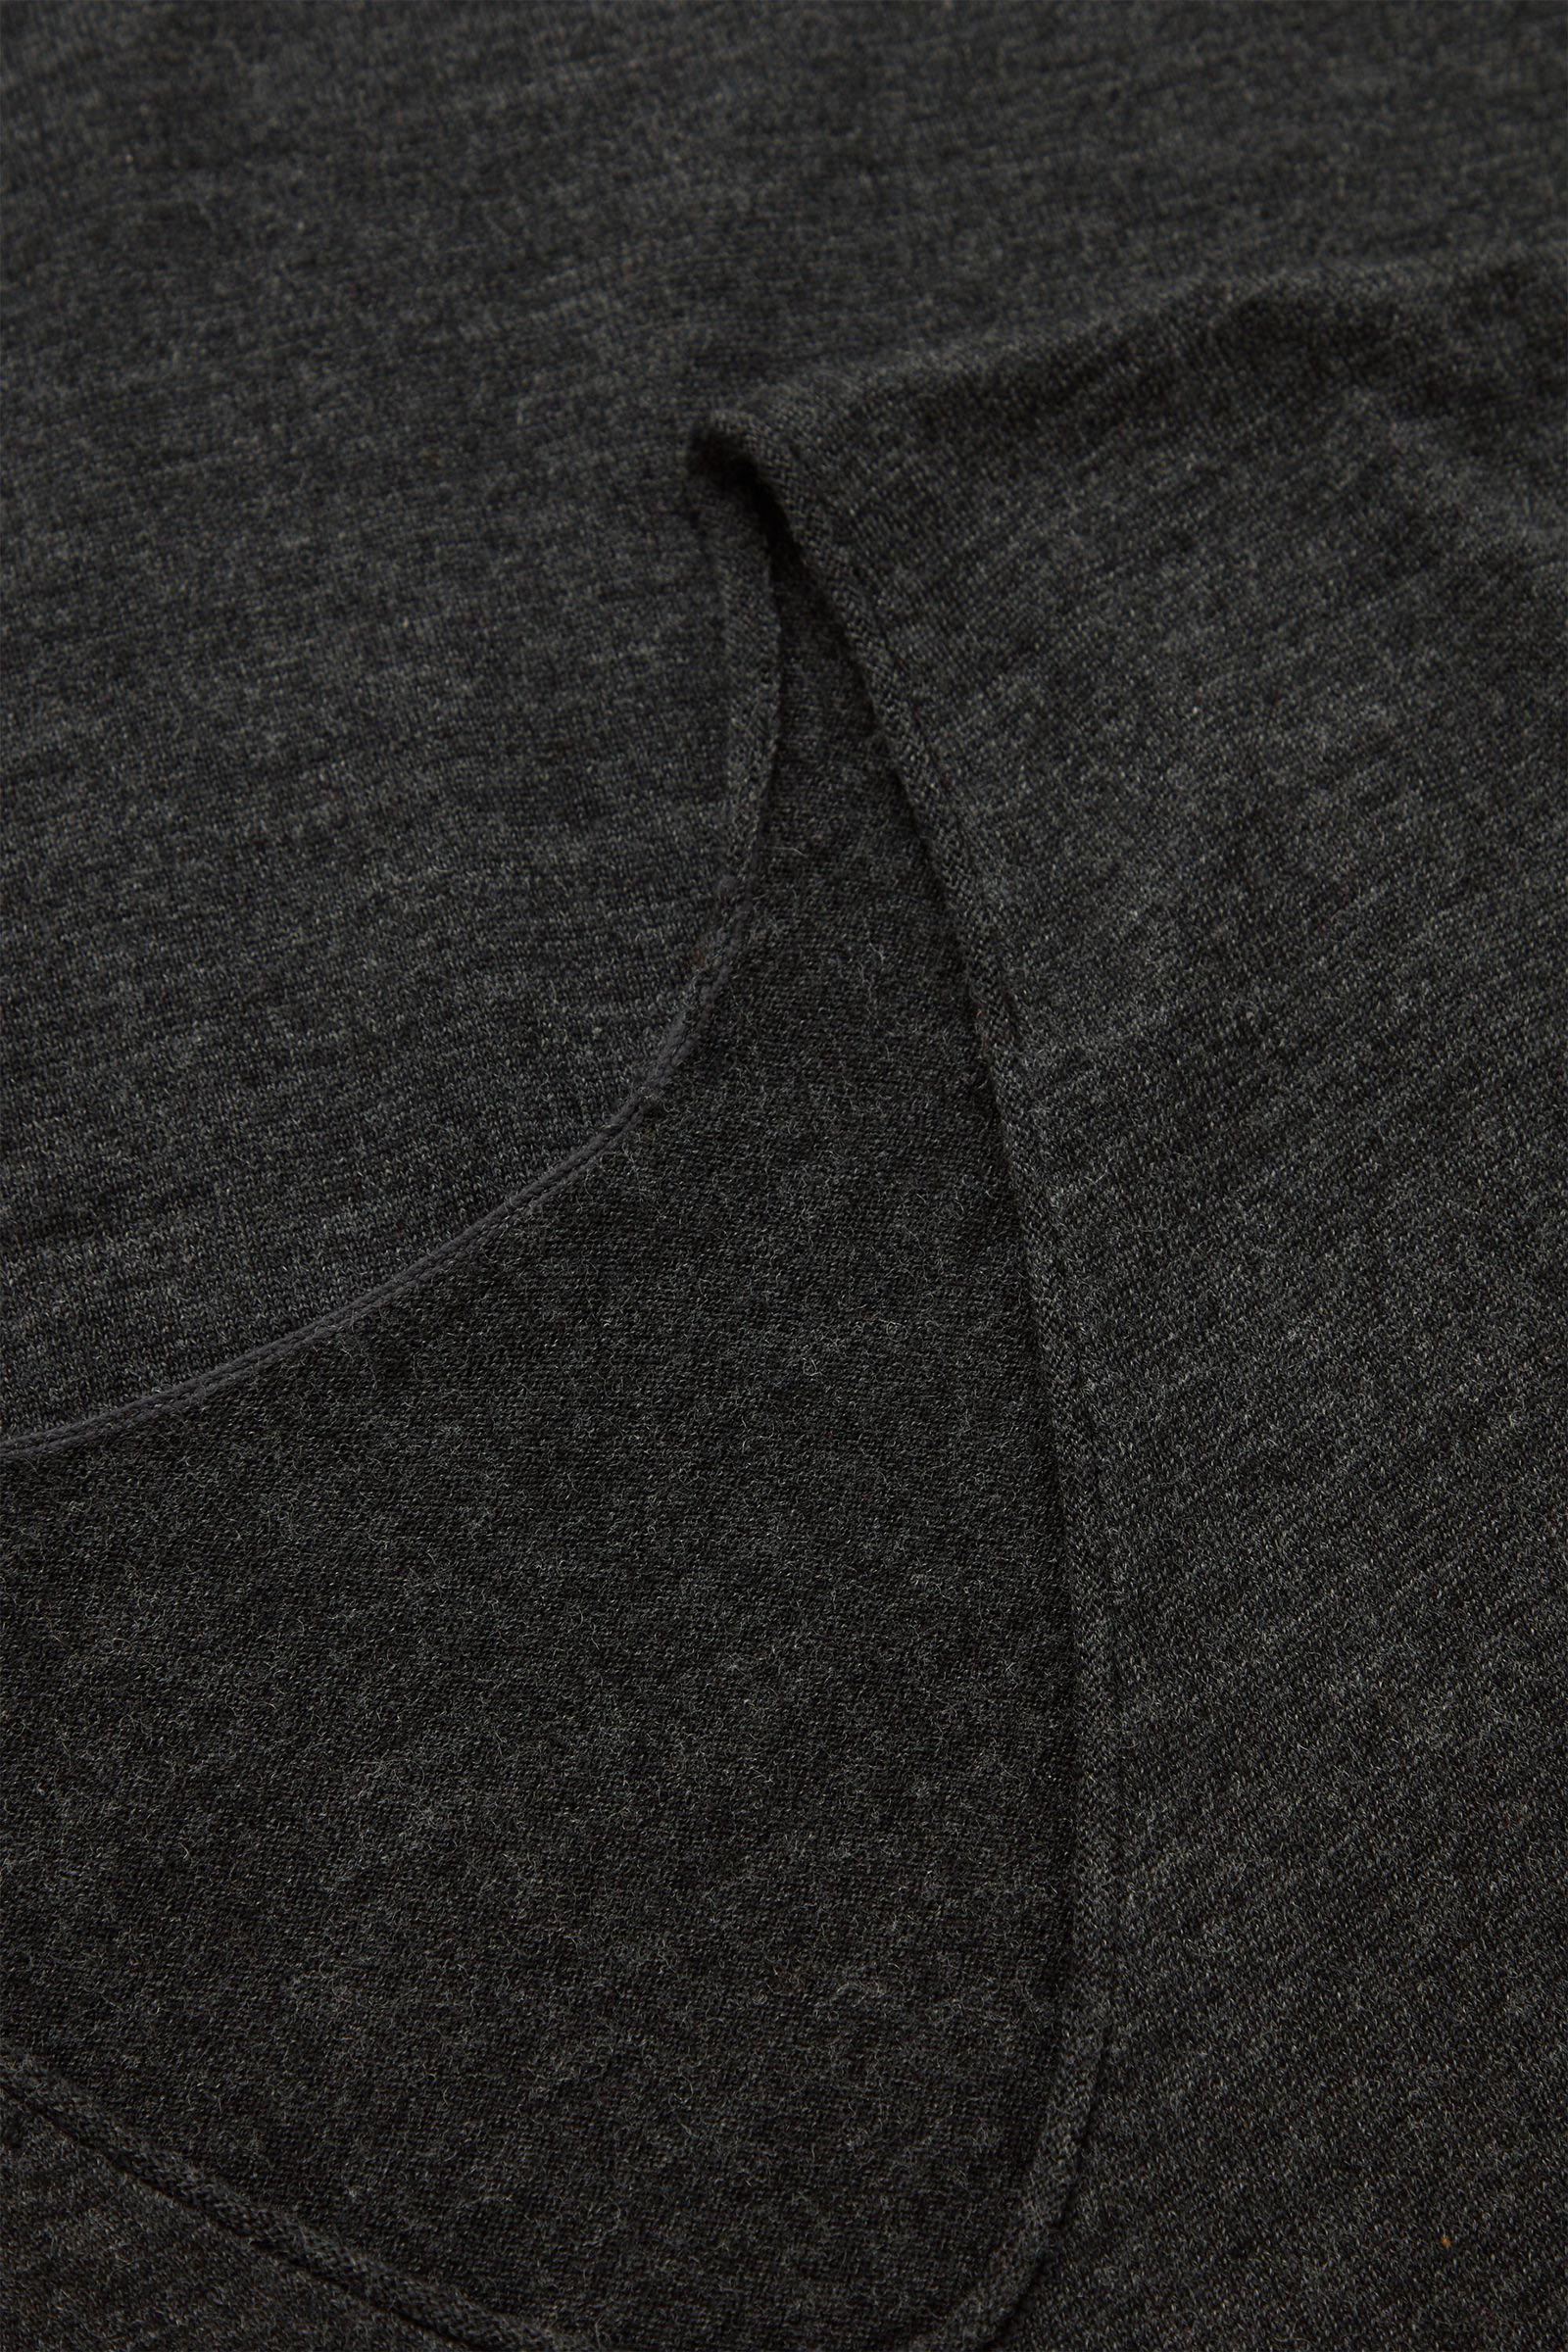 COS 롱 울 니티드 드레스의 그레이컬러 Detail입니다.